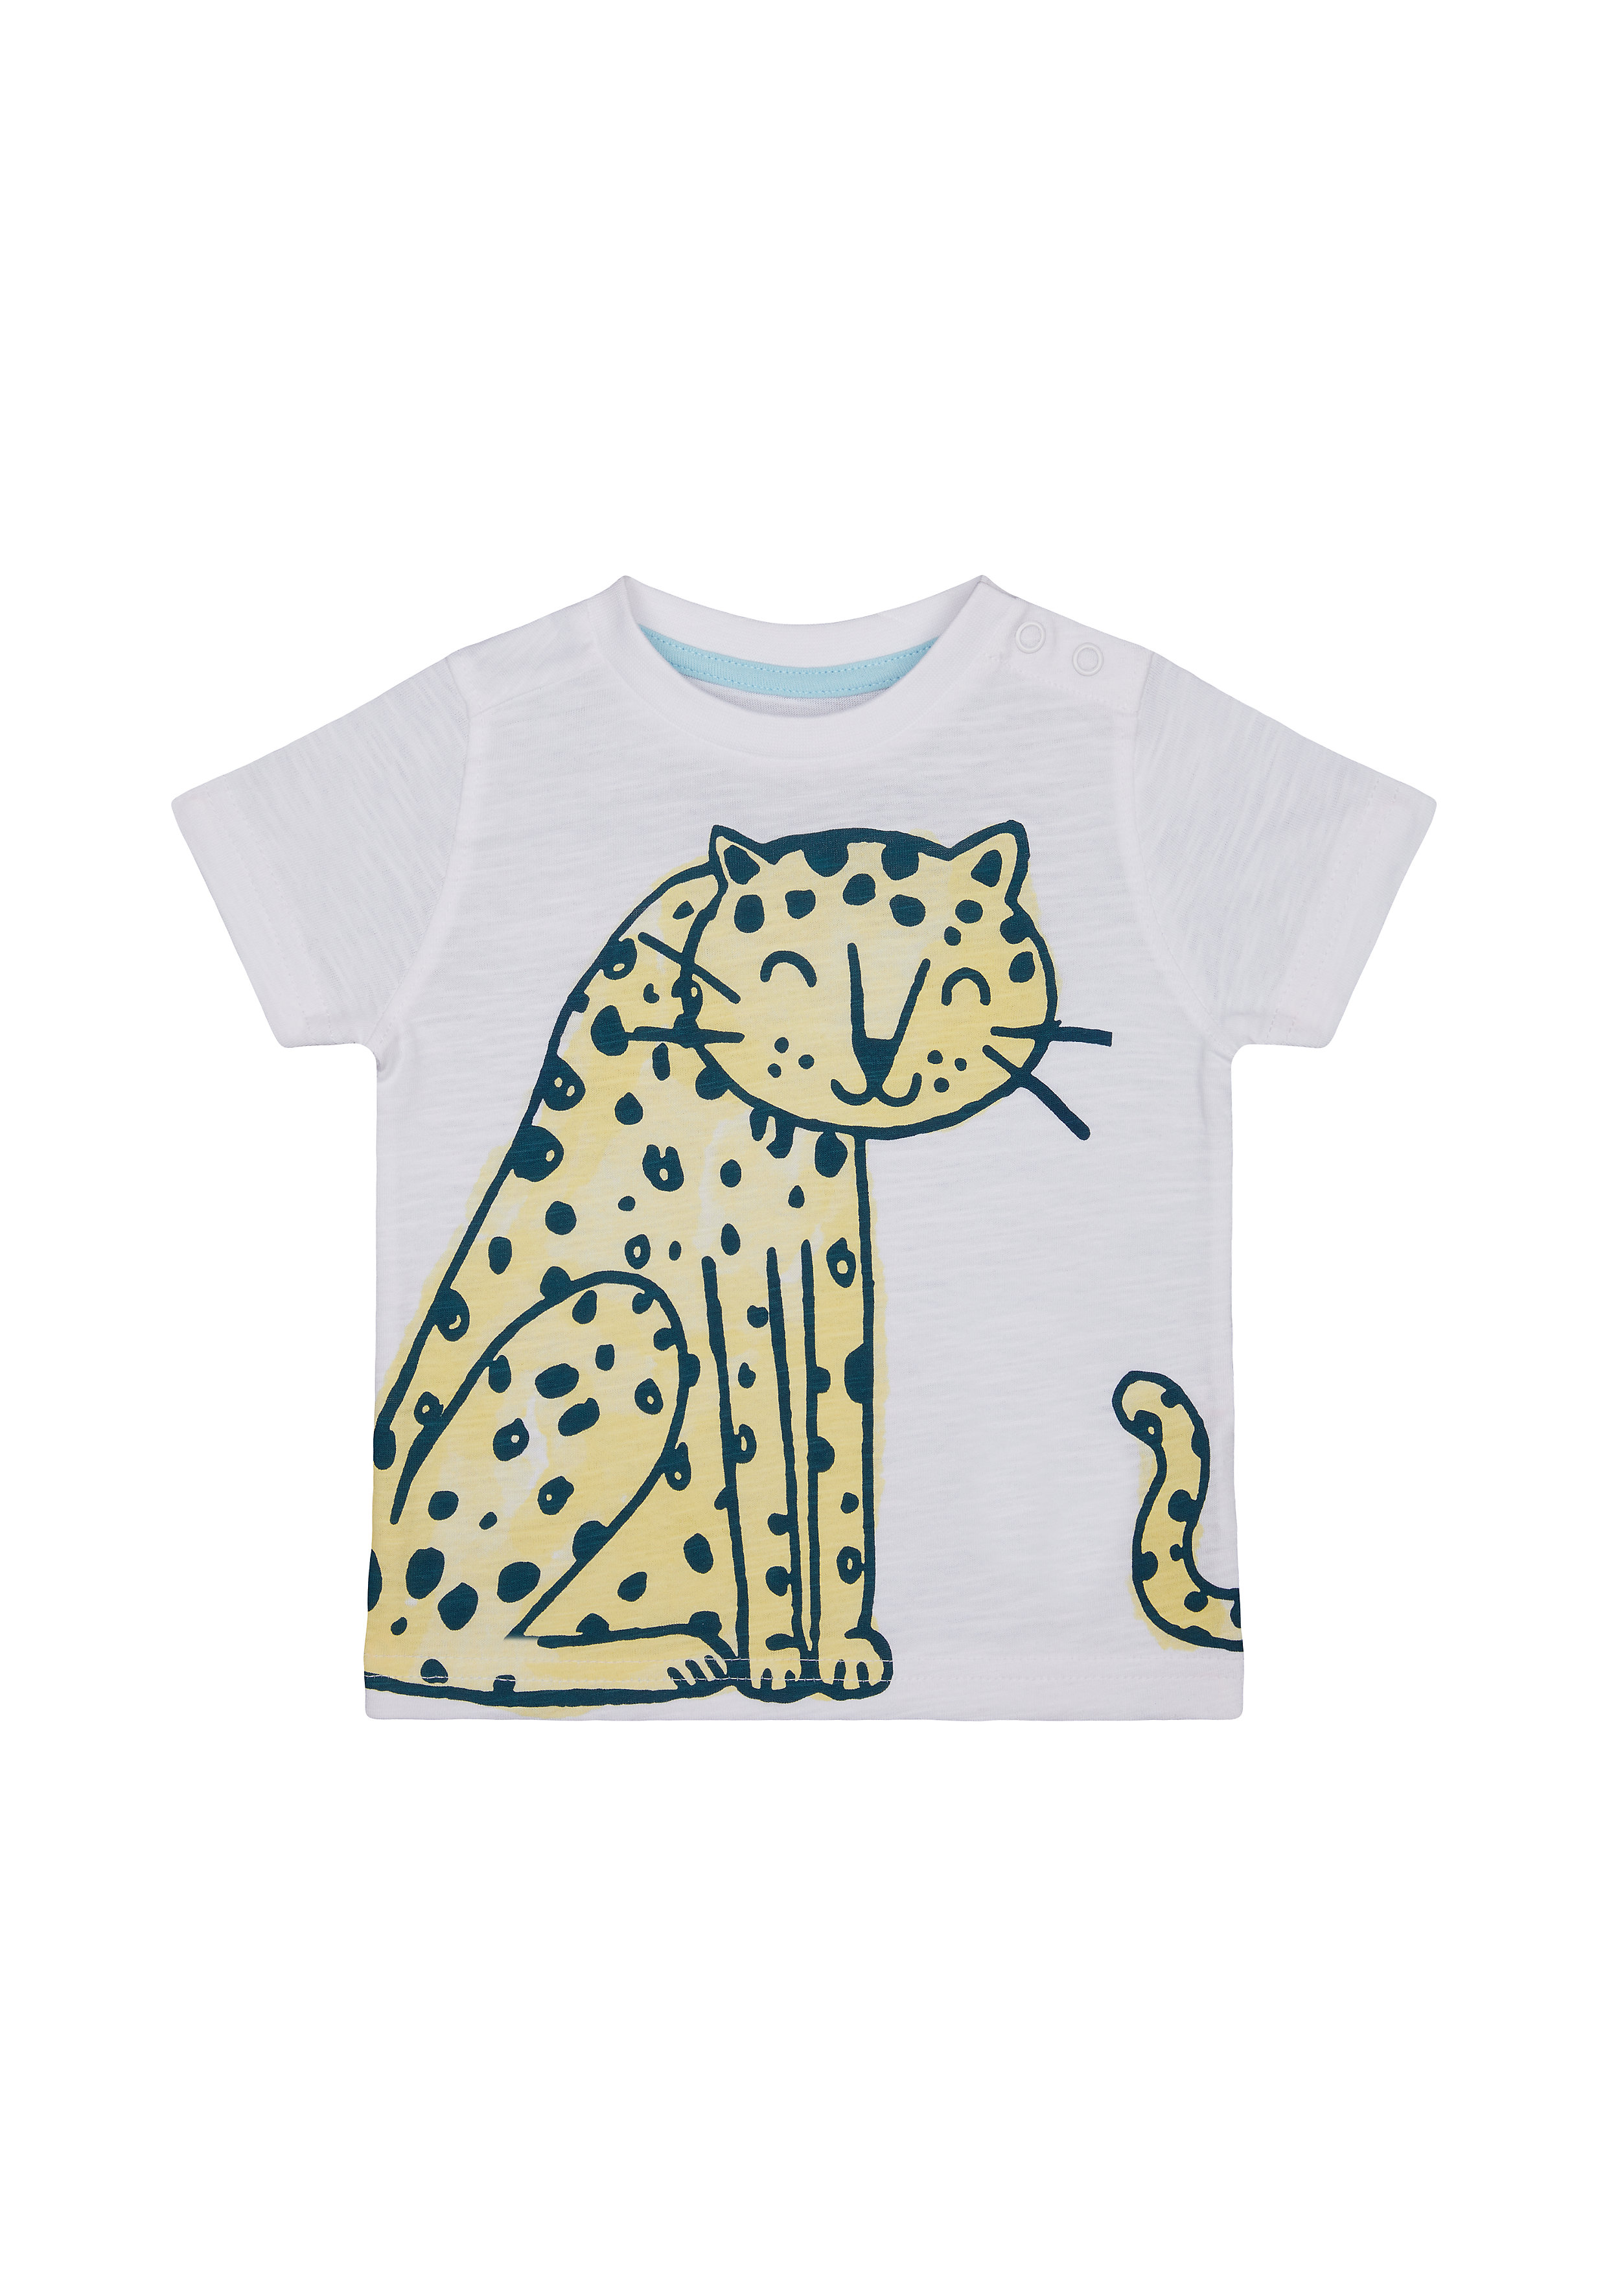 Mothercare | Boys Half Sleeves T-Shirt Leopard Print - White